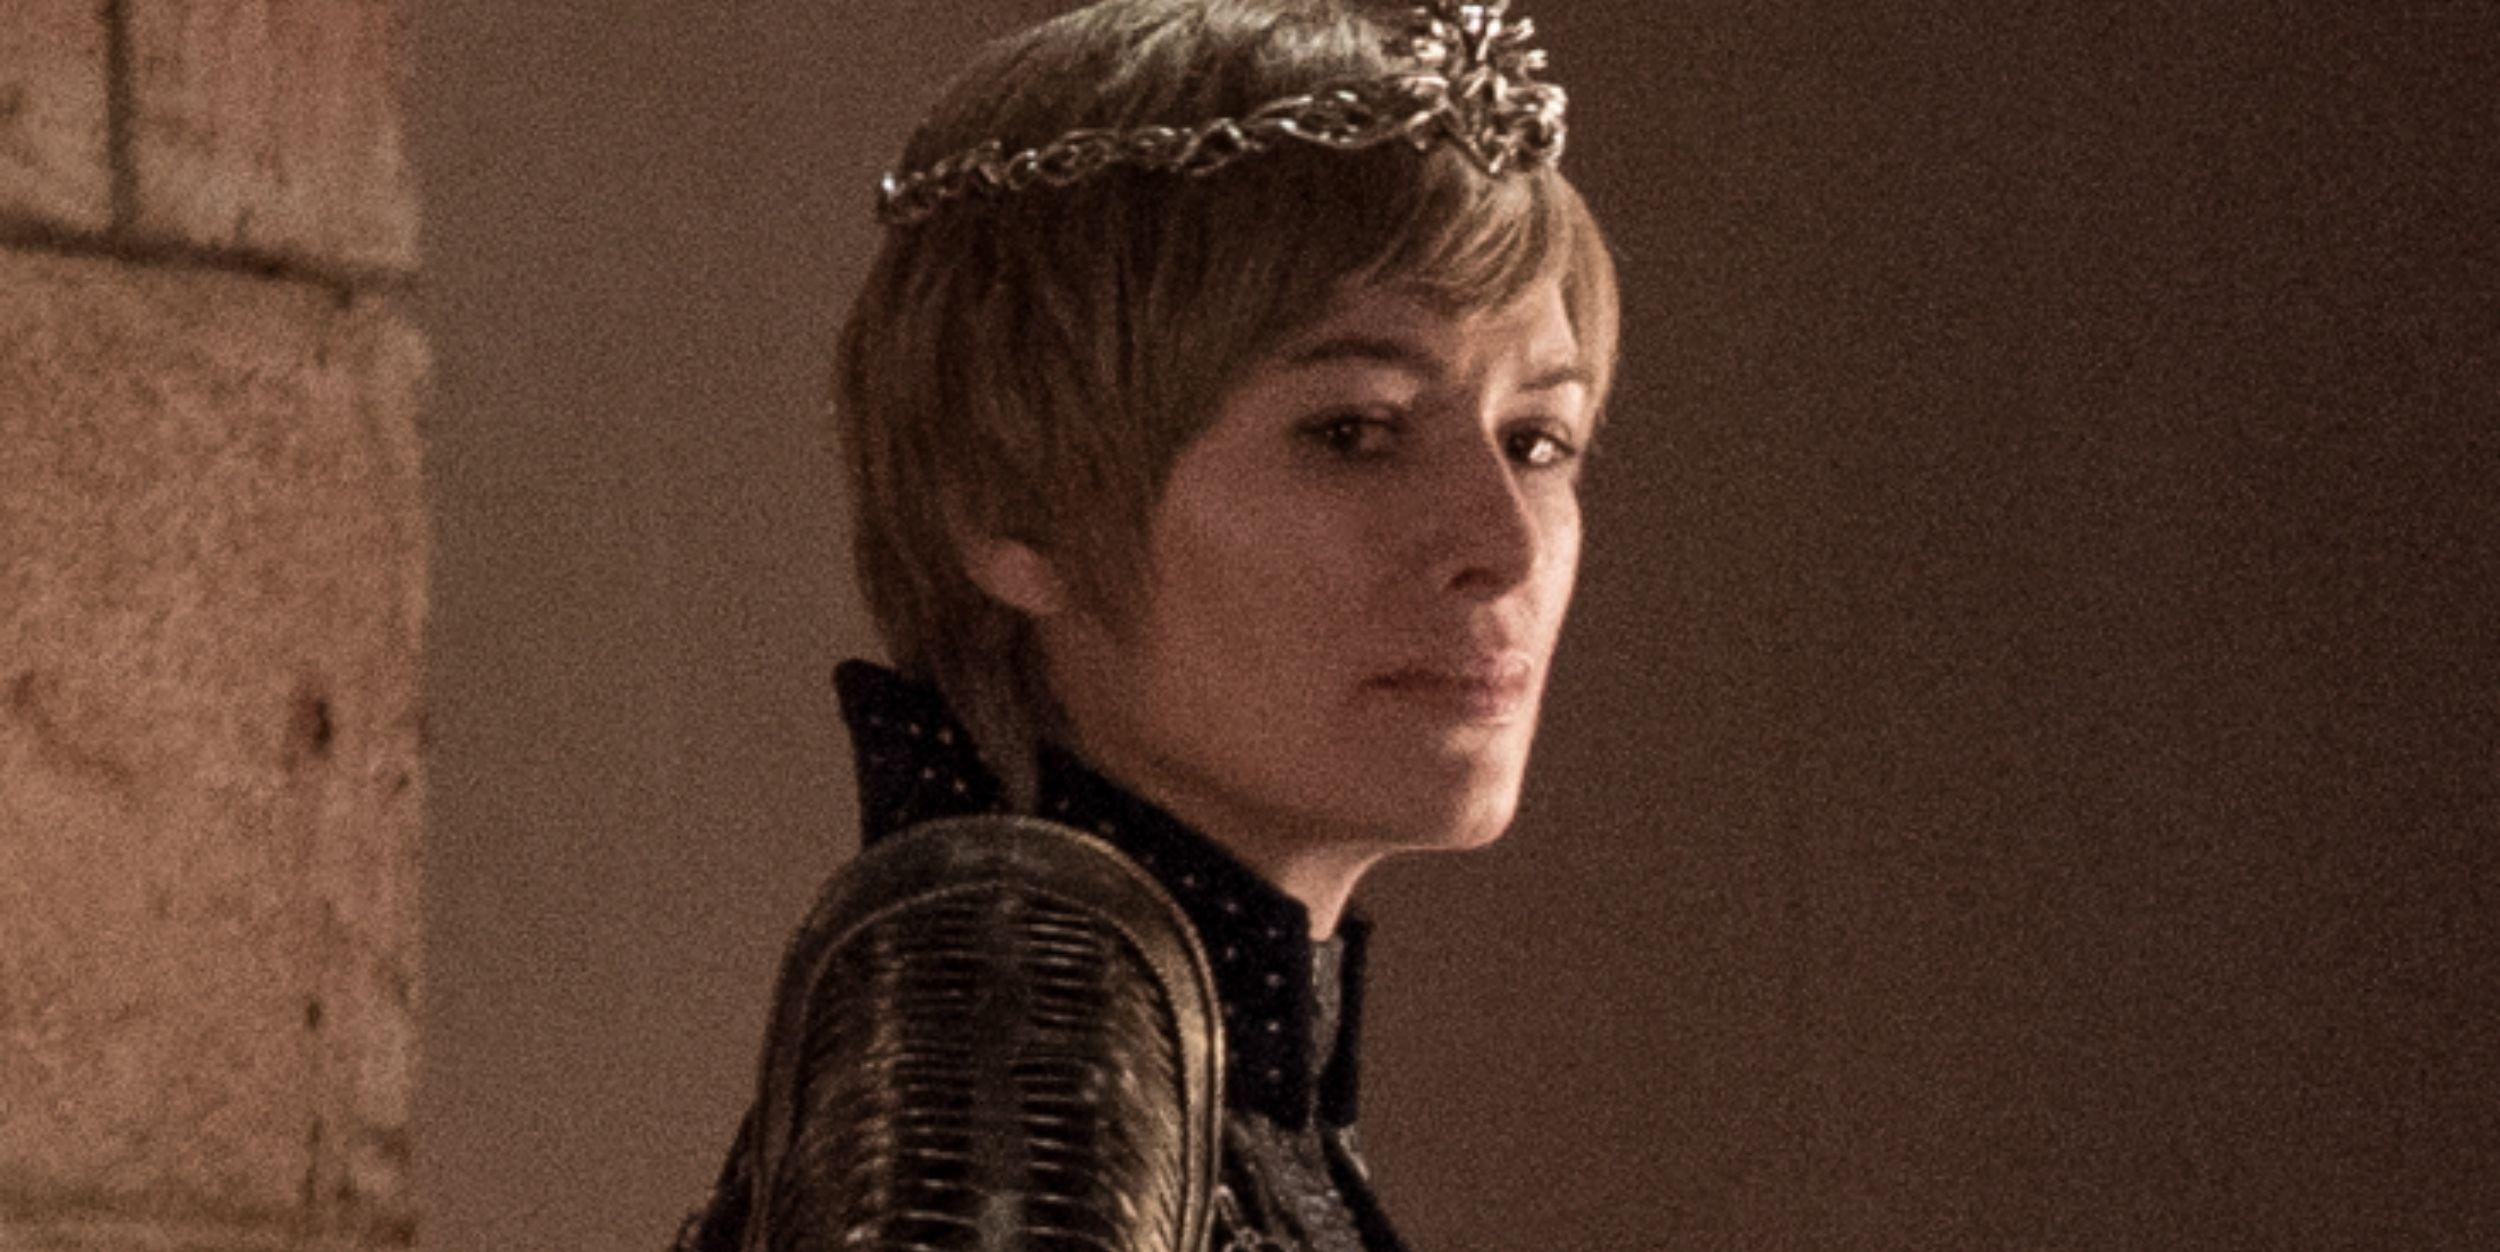 Cersei (Lena Headey) in Game of Thrones season 8